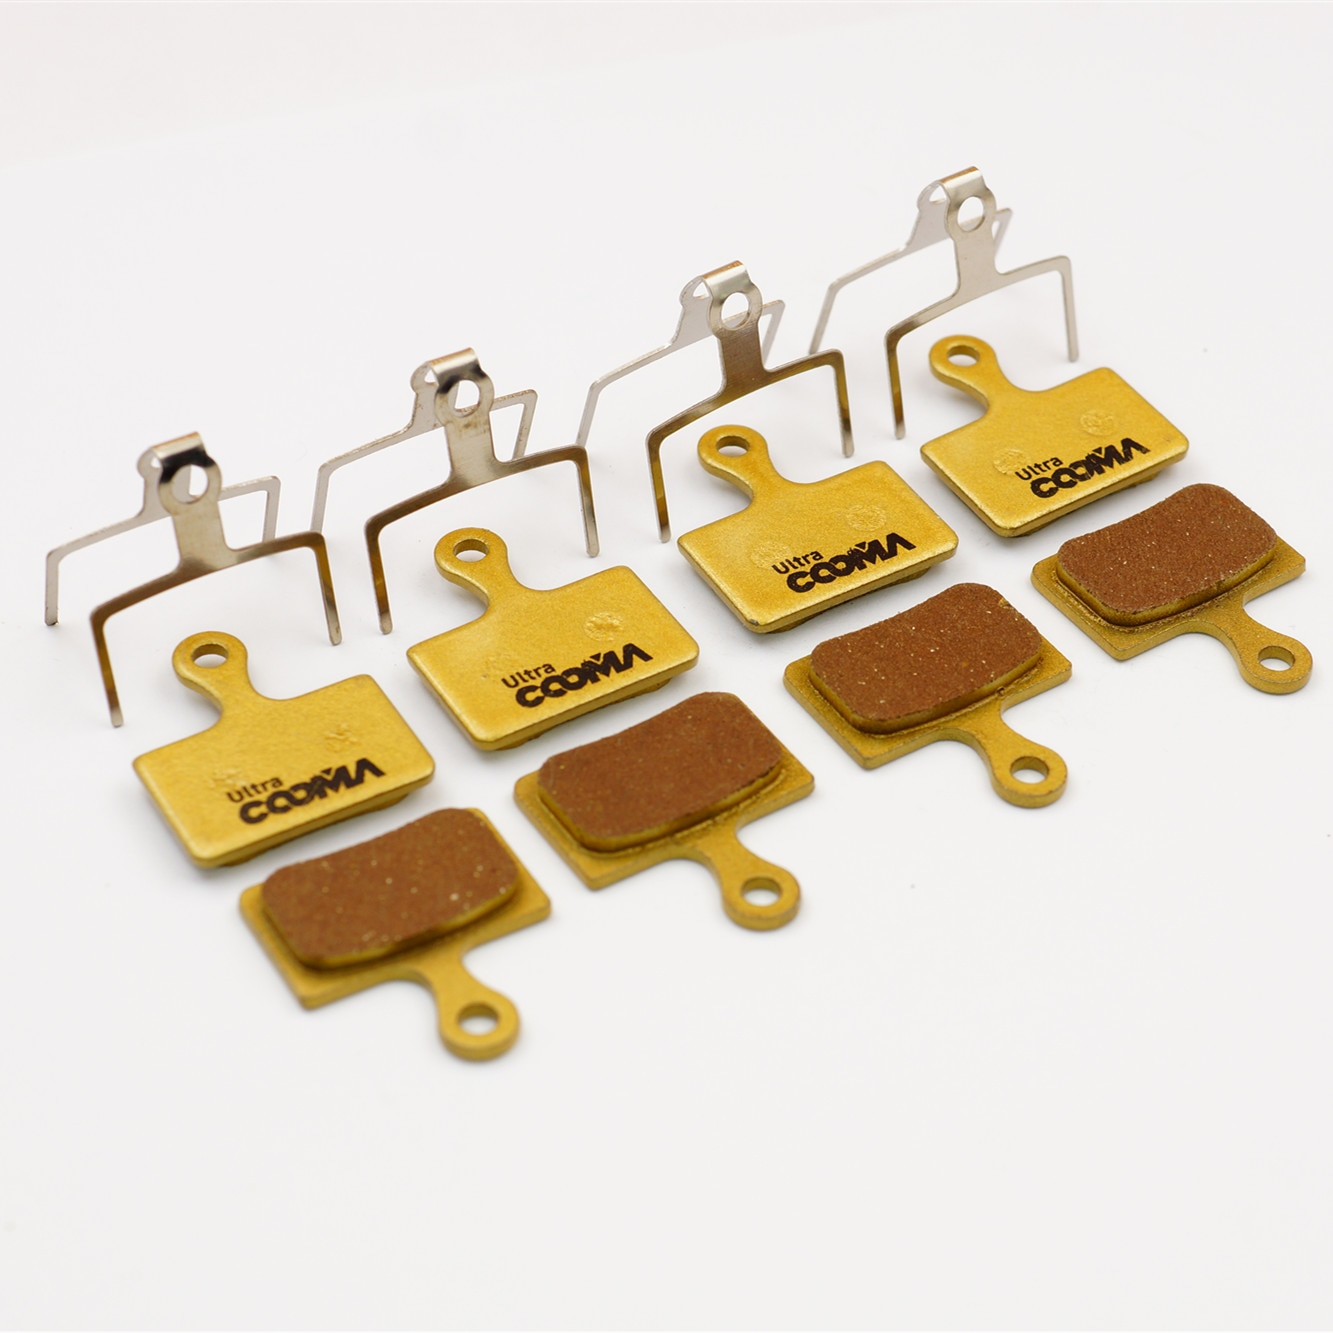 Pastillas de freno de bicicleta para SHIMANO M9100 R9170 Ultegra R8070, U5000, RS805, RS505, RS405 RS305 freno de disco de carretera, 4 pares, Gold Ultra